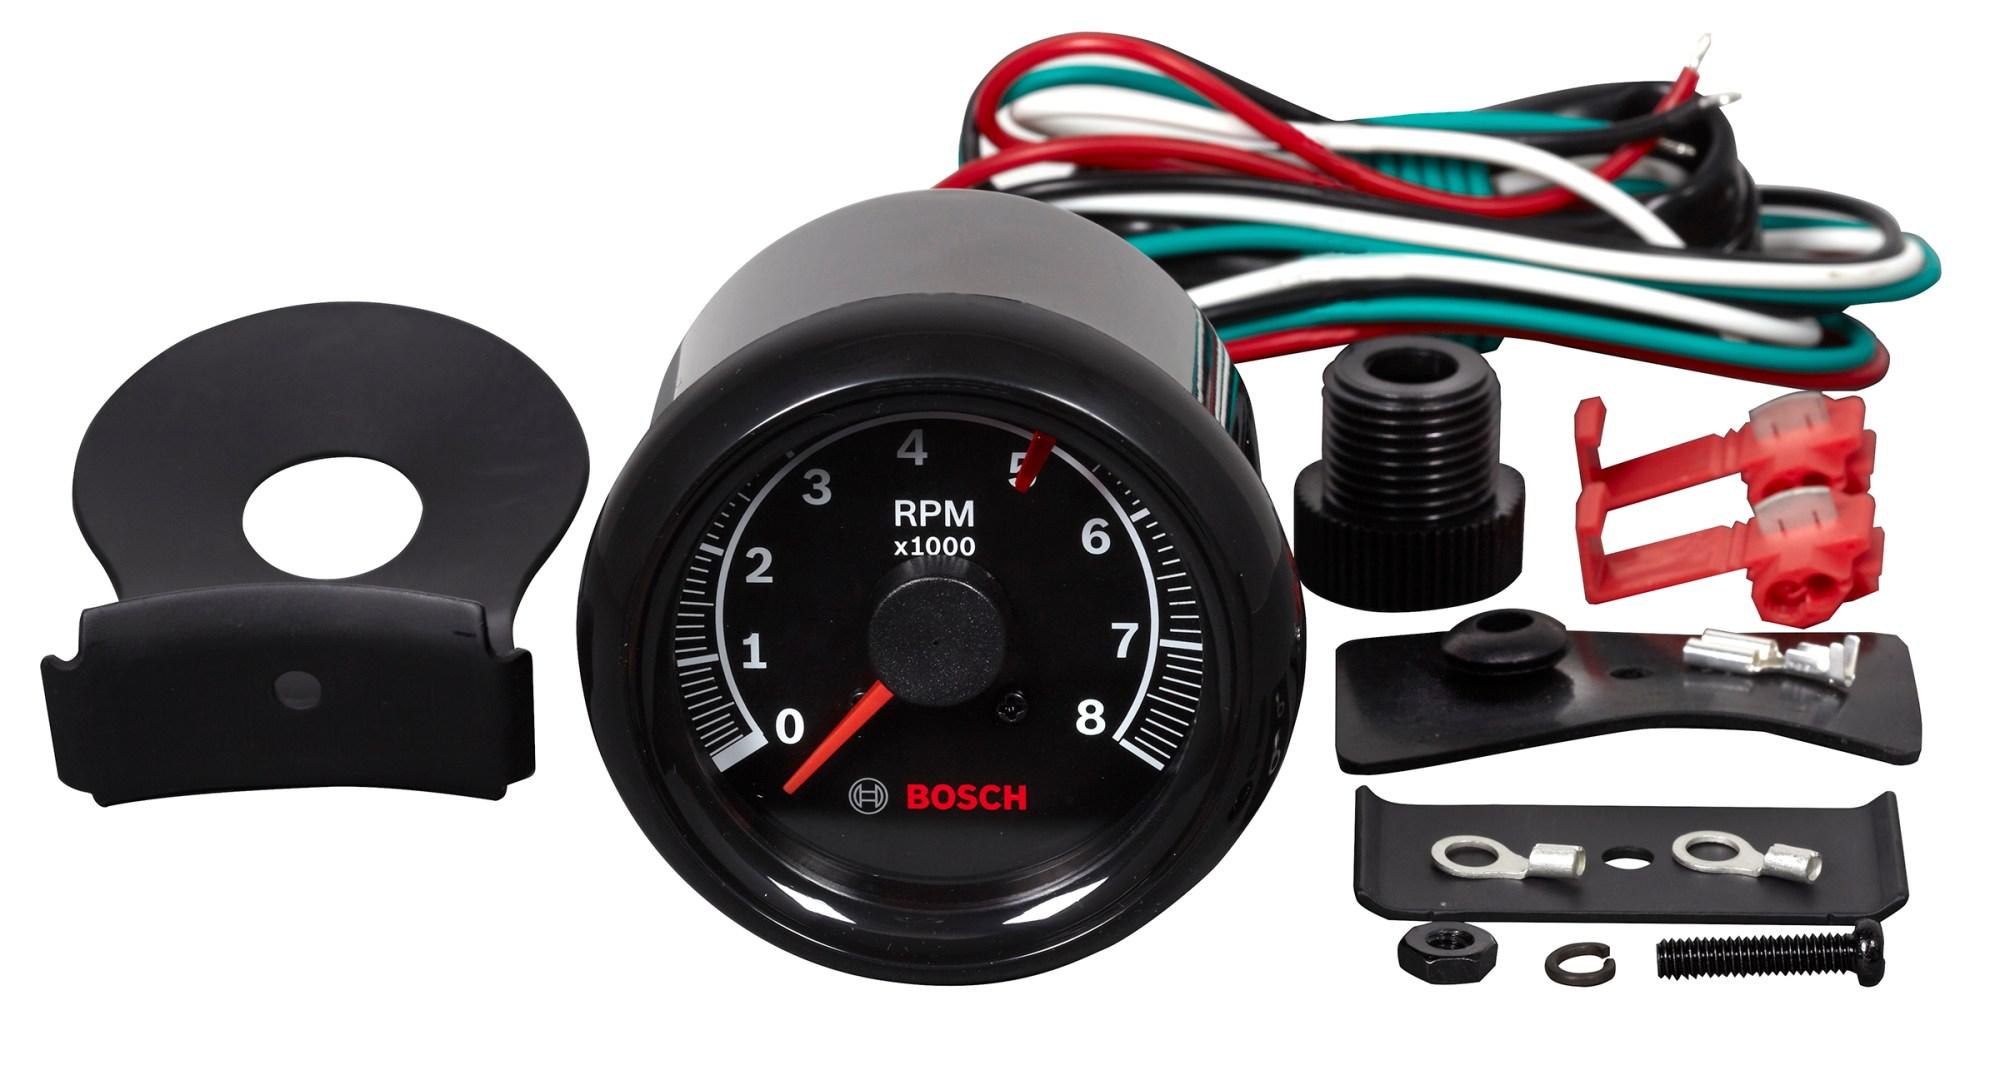 hight resolution of sport ii 2 5 8 quot tachometer black face fst 7906 otc tools new sun tachometer bosch tachometer wiring